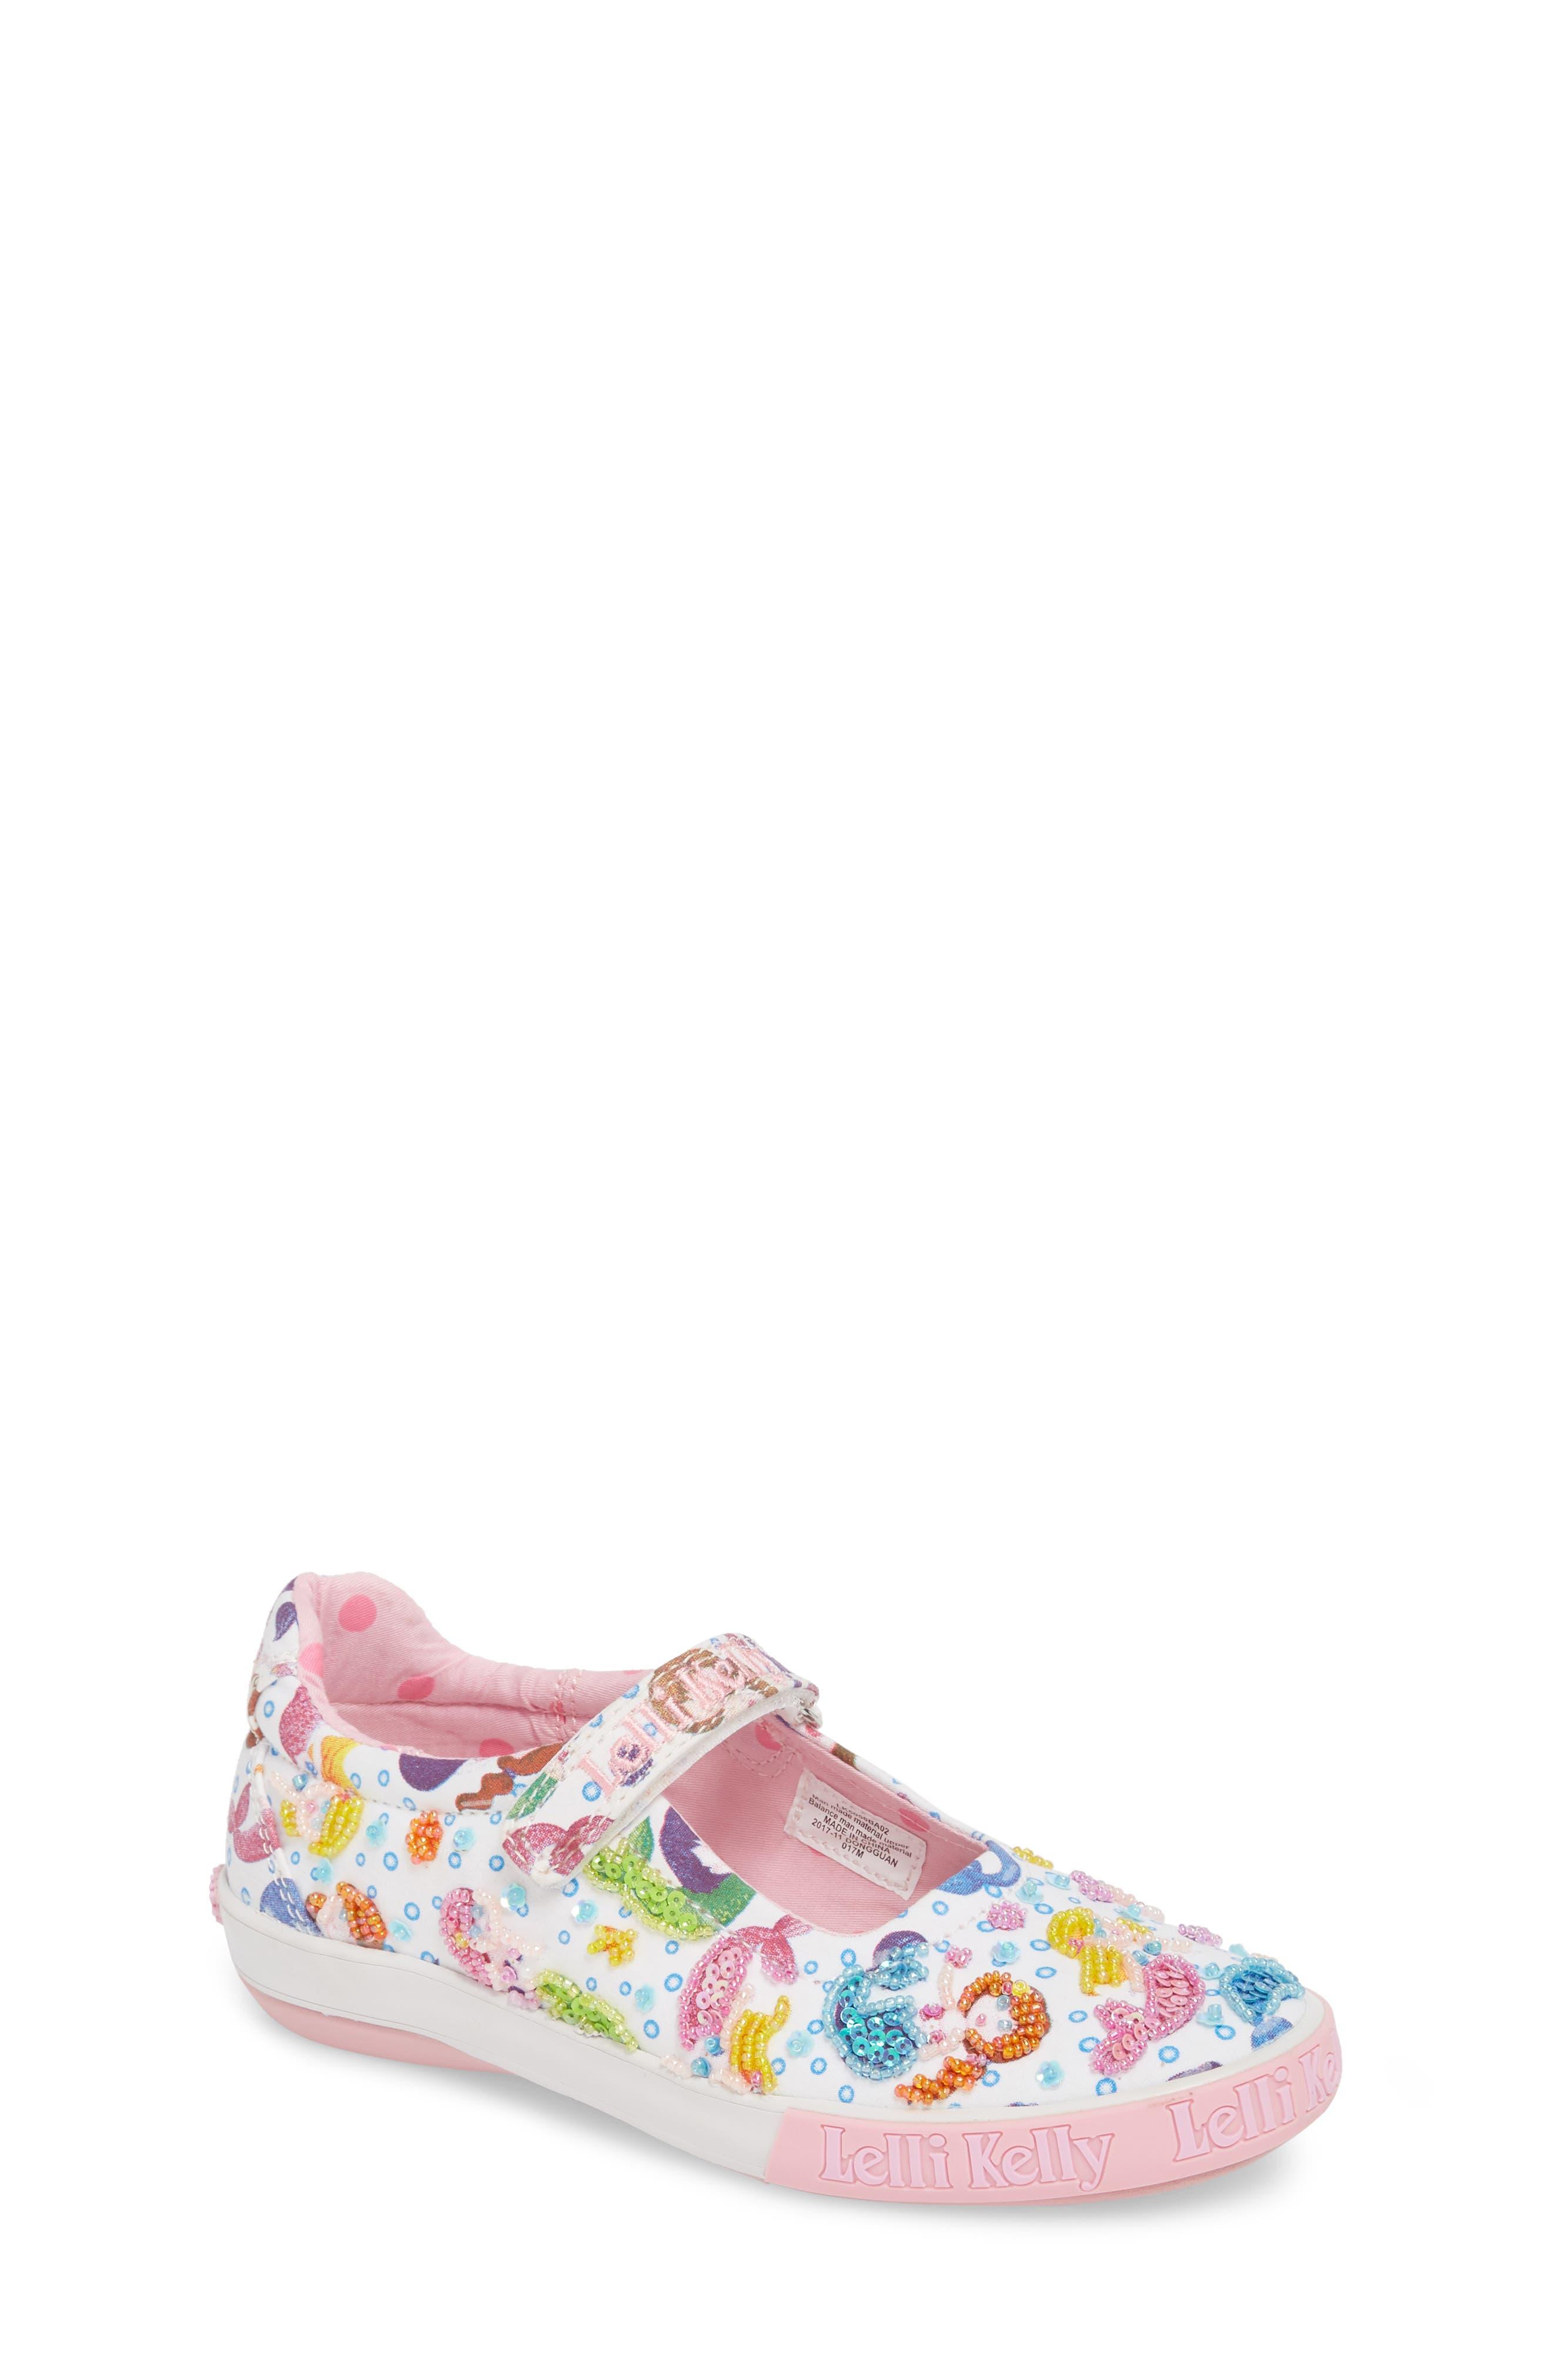 Beaded Mary Jane Sneaker,                             Main thumbnail 1, color,                             WHITE